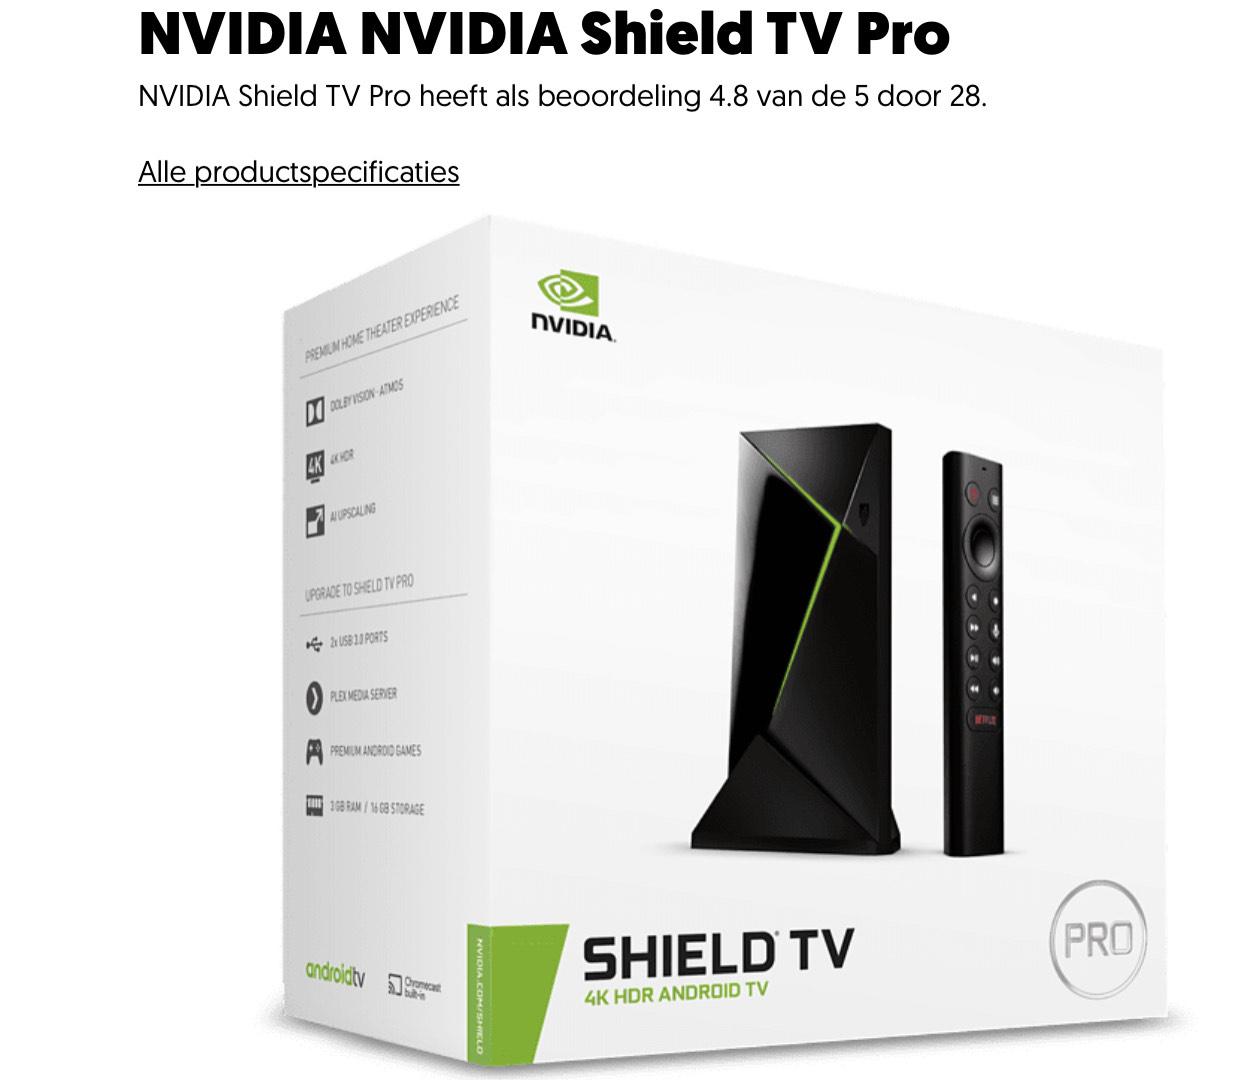 NVIDIA NVIDIA Shield TV Pro (nog goedkoper met trucjes)